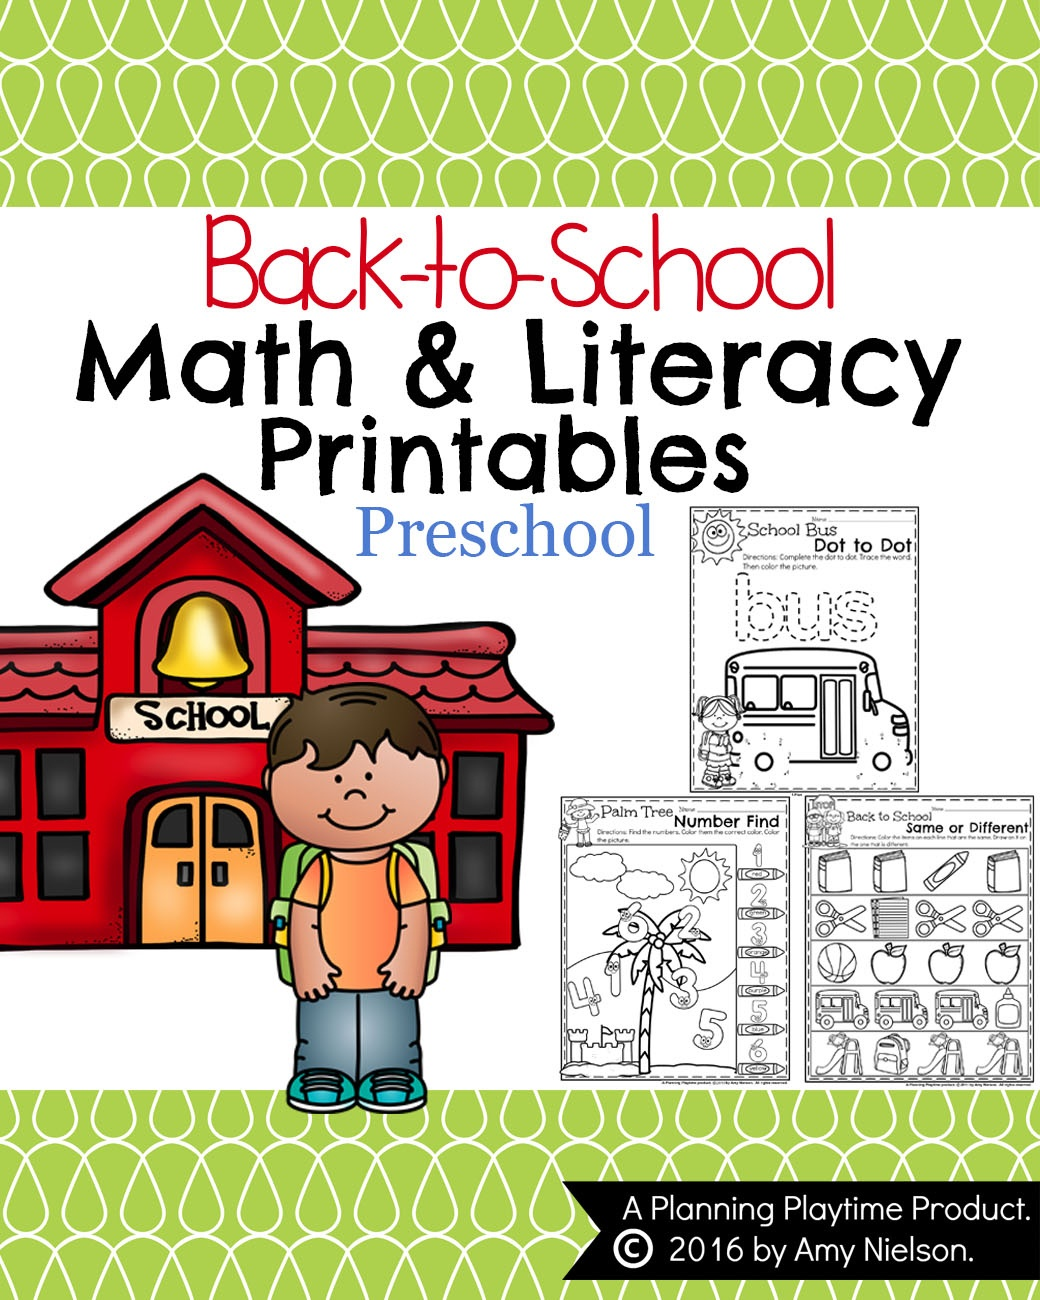 Back To School Preschool Worksheets - Planning Playtime - Froggy Goes To School Free Printables